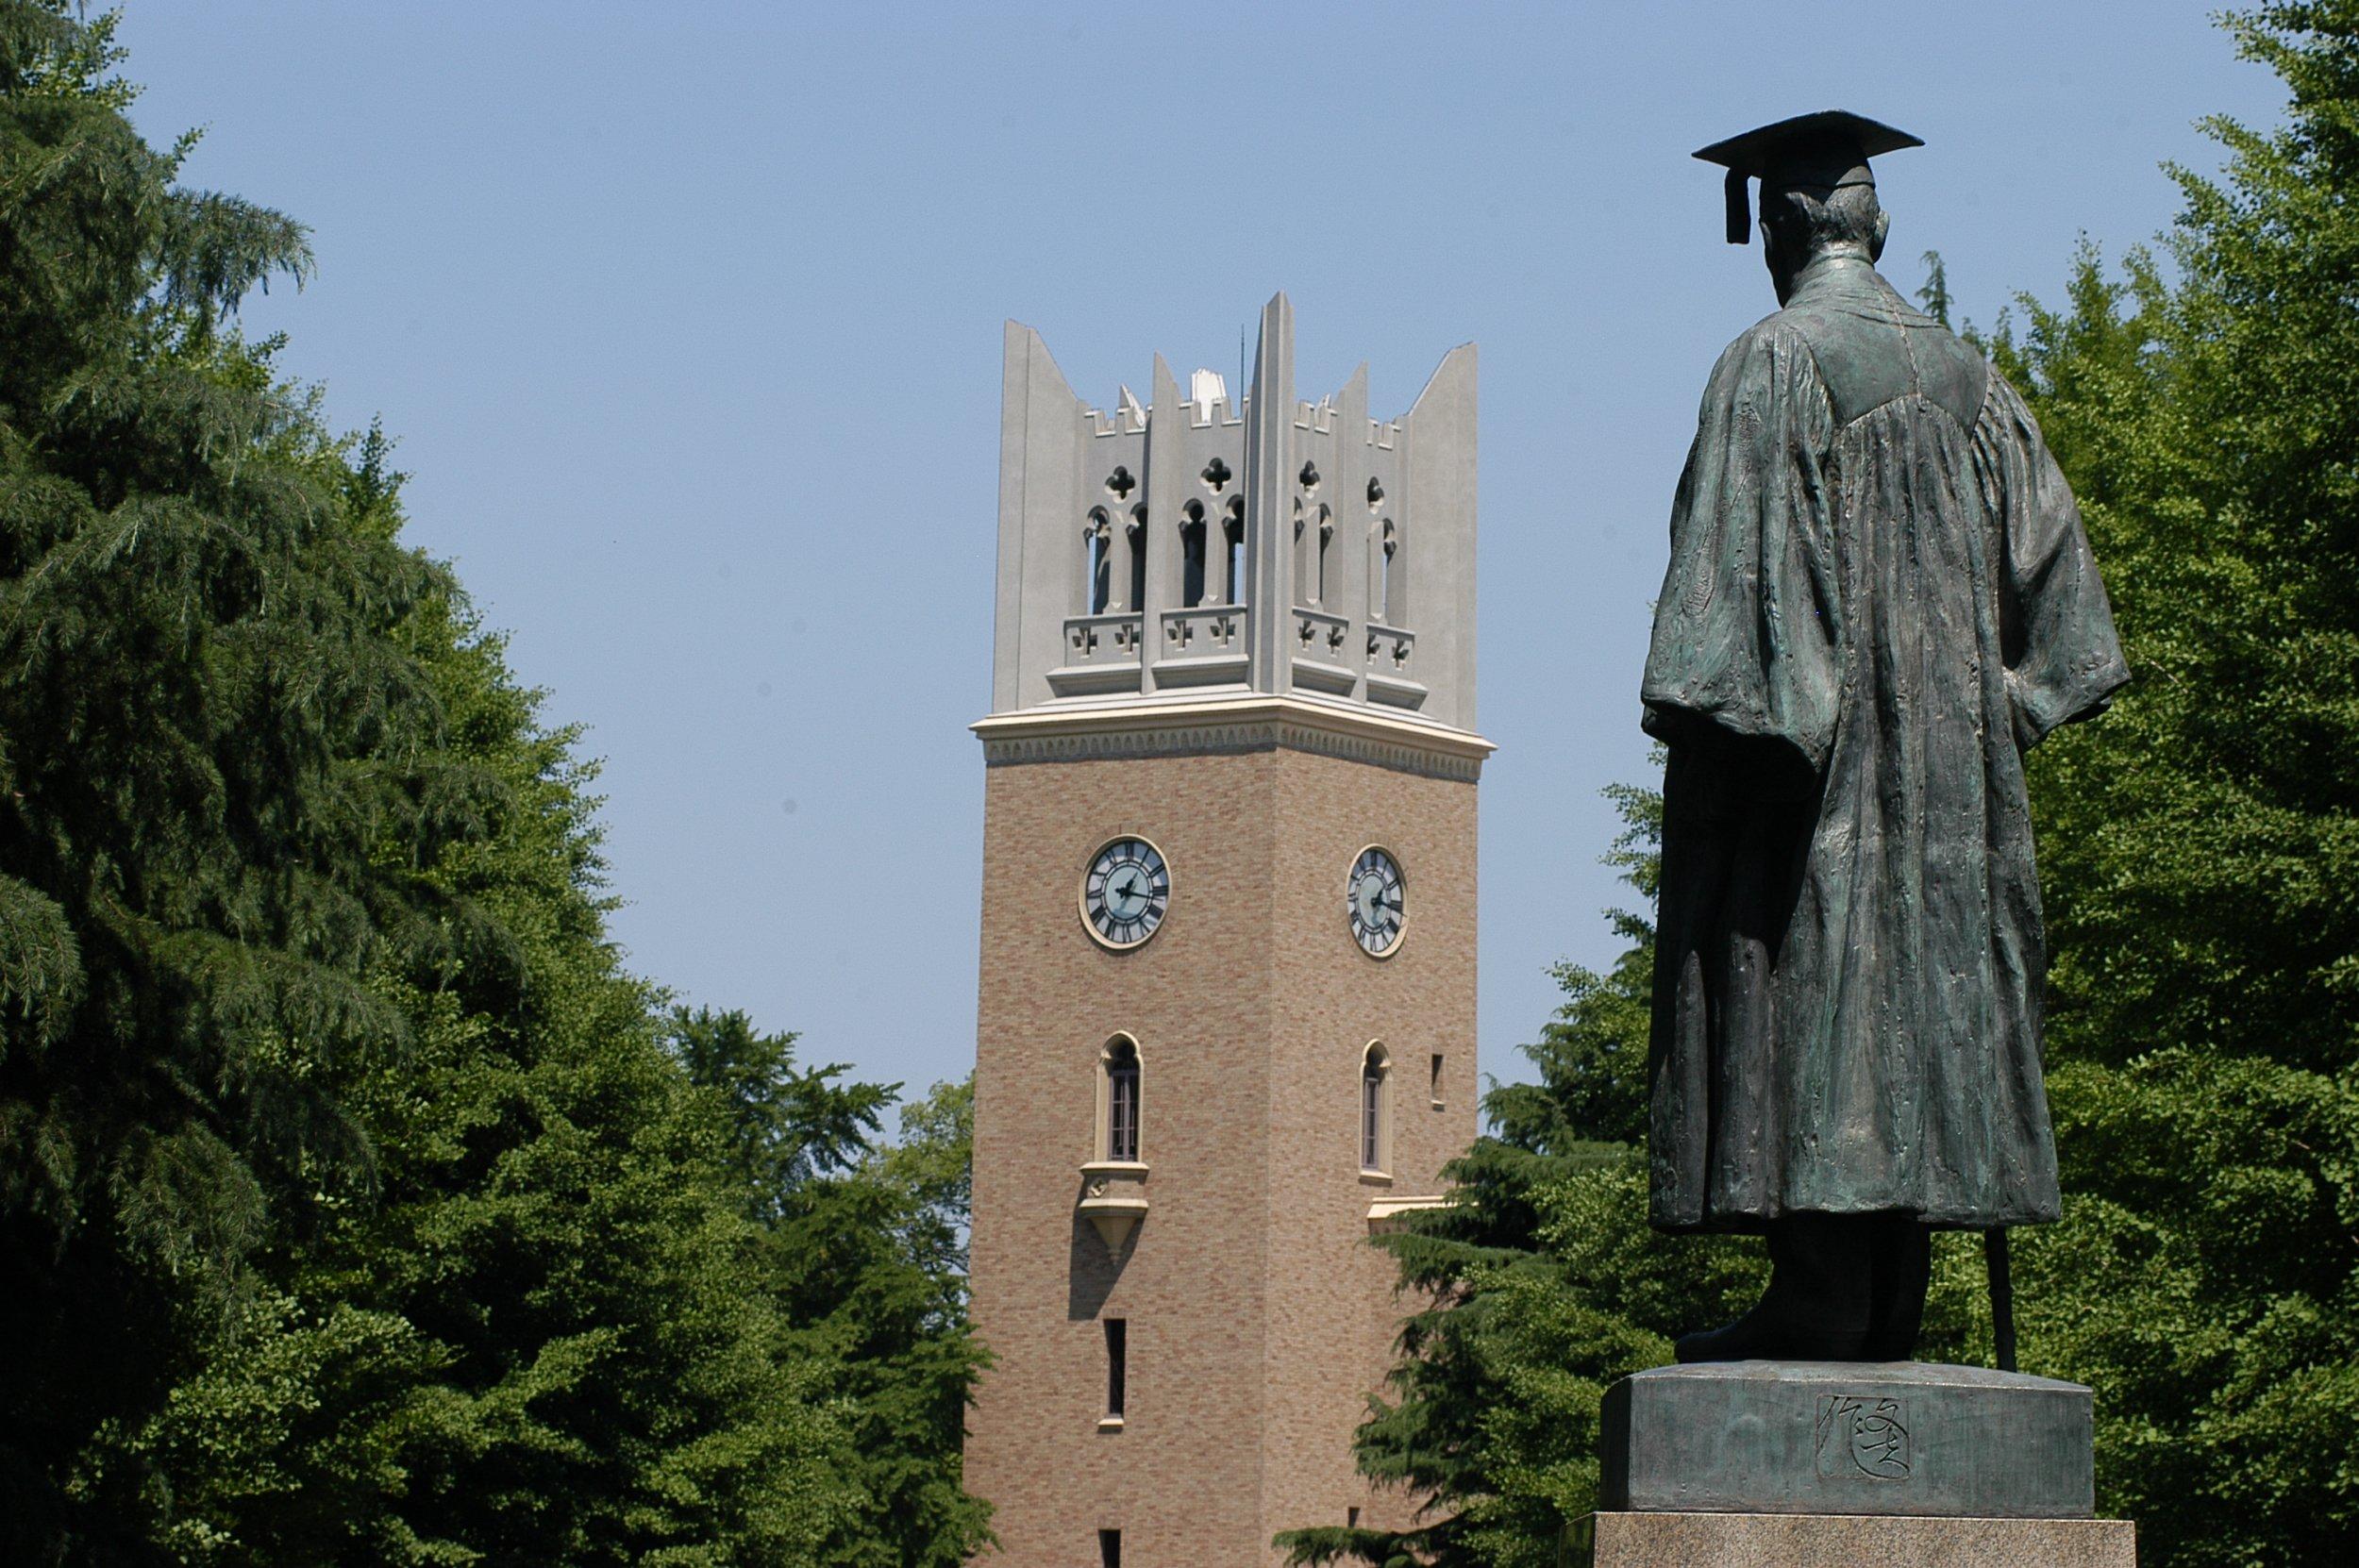 Waseda Business School (Graduate School of Business and Finance)